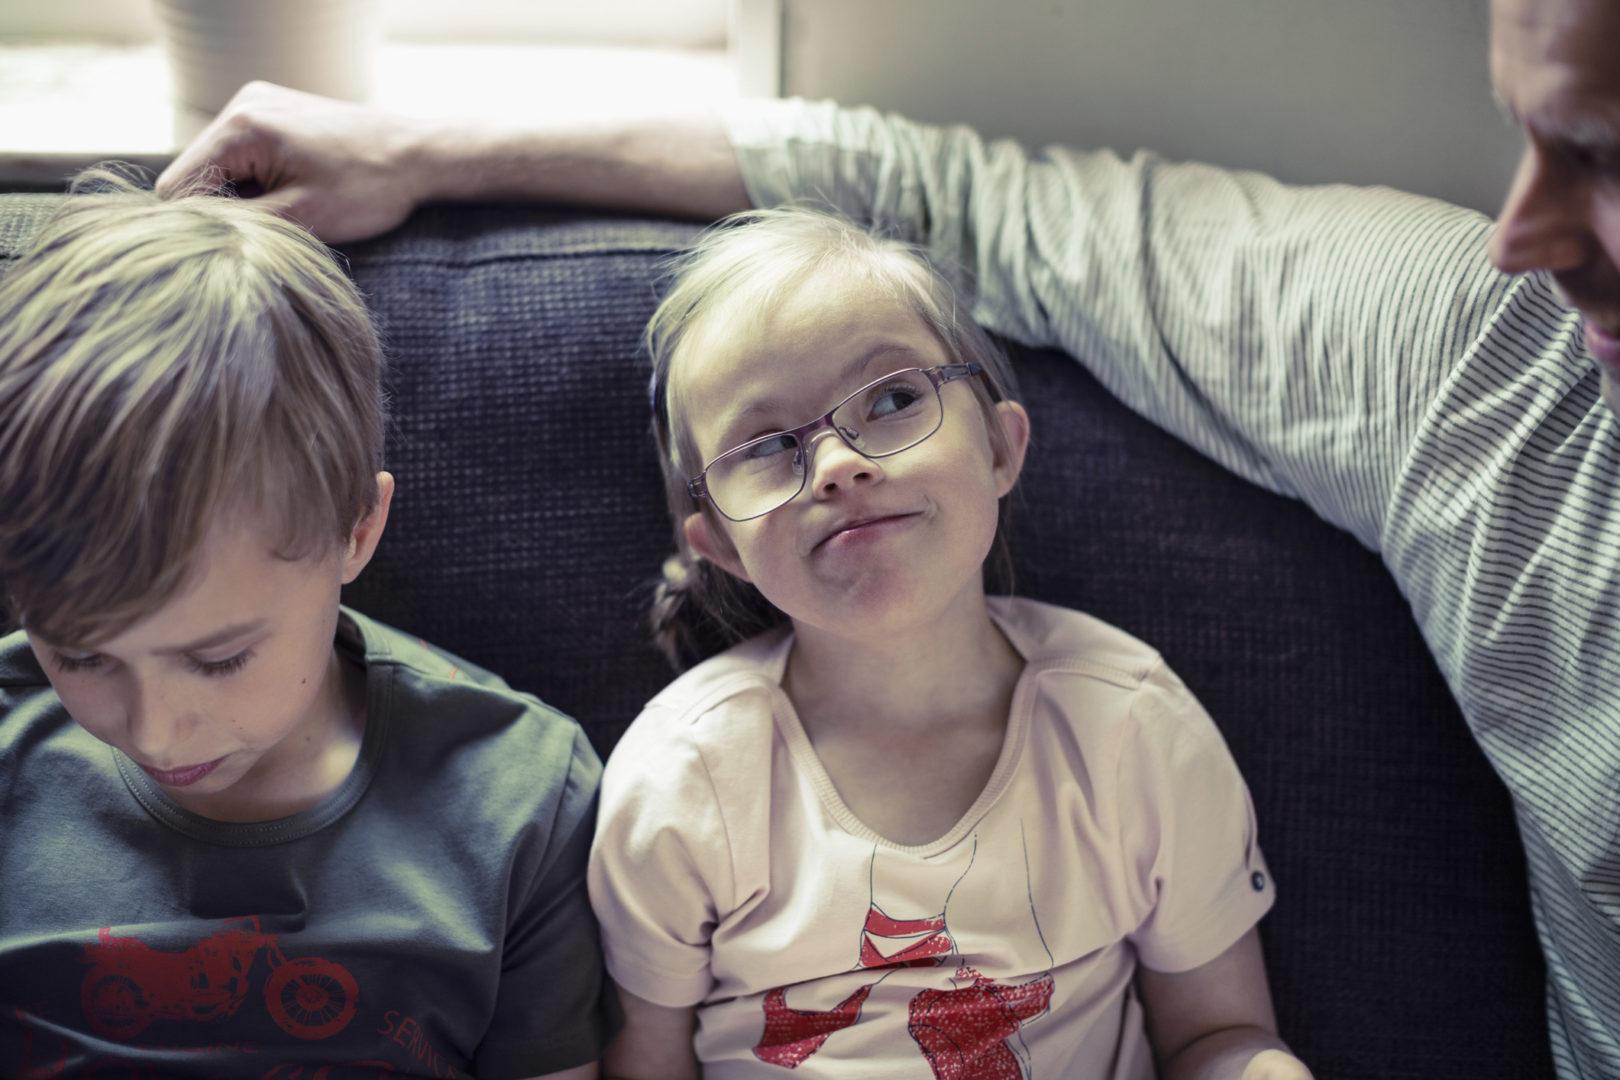 8 helpful special needs organizations